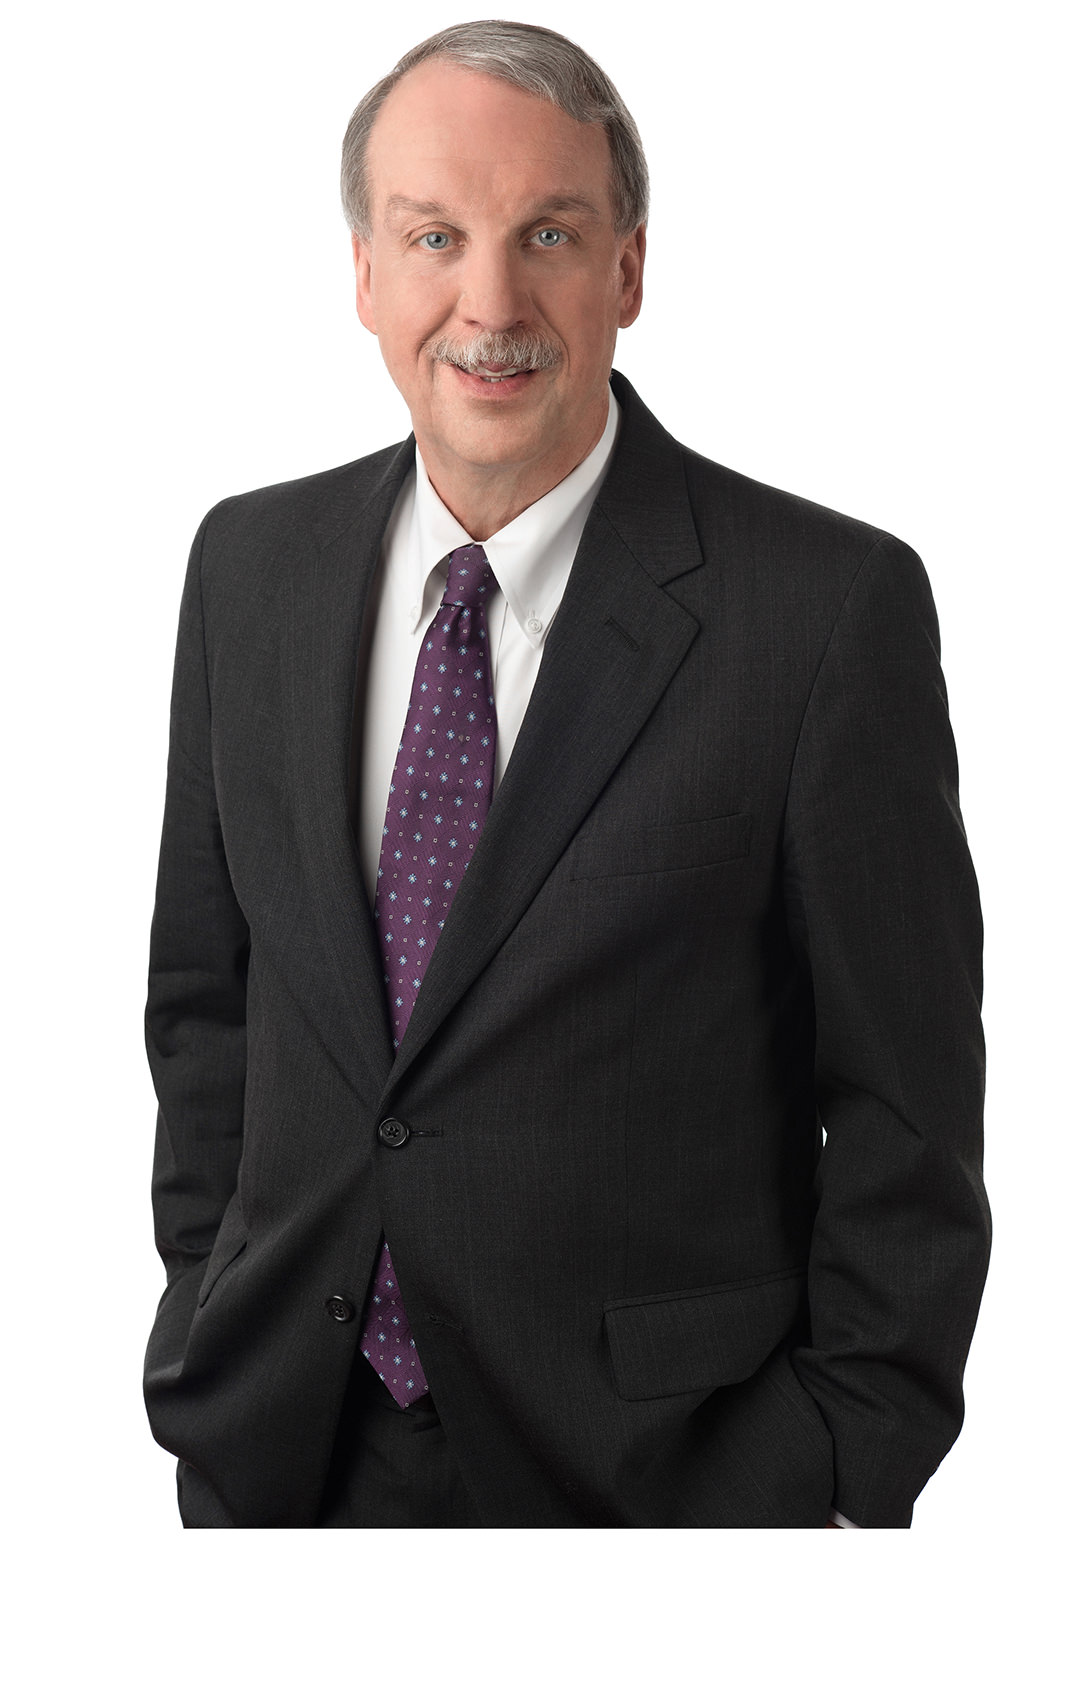 Robert L. Hoegle